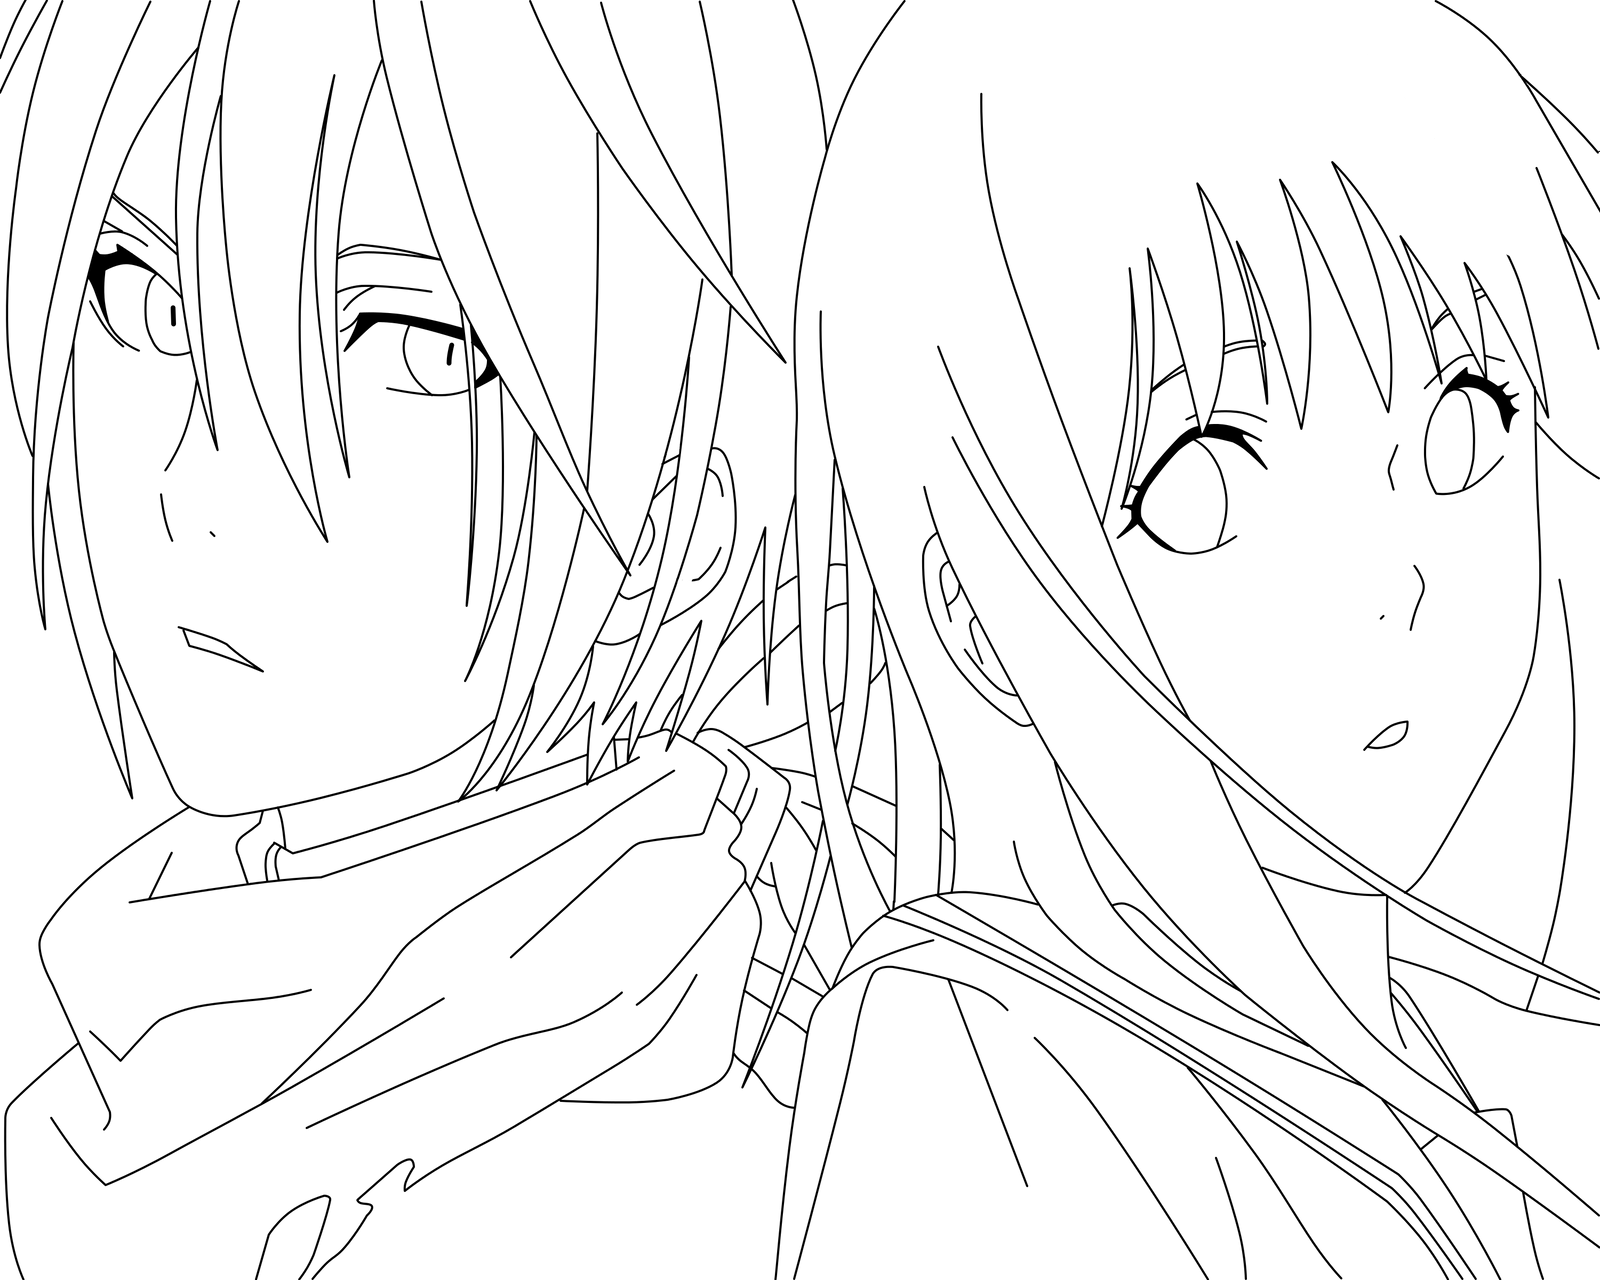 Line Drawing Name : Noragami hiyori drawing related keywords